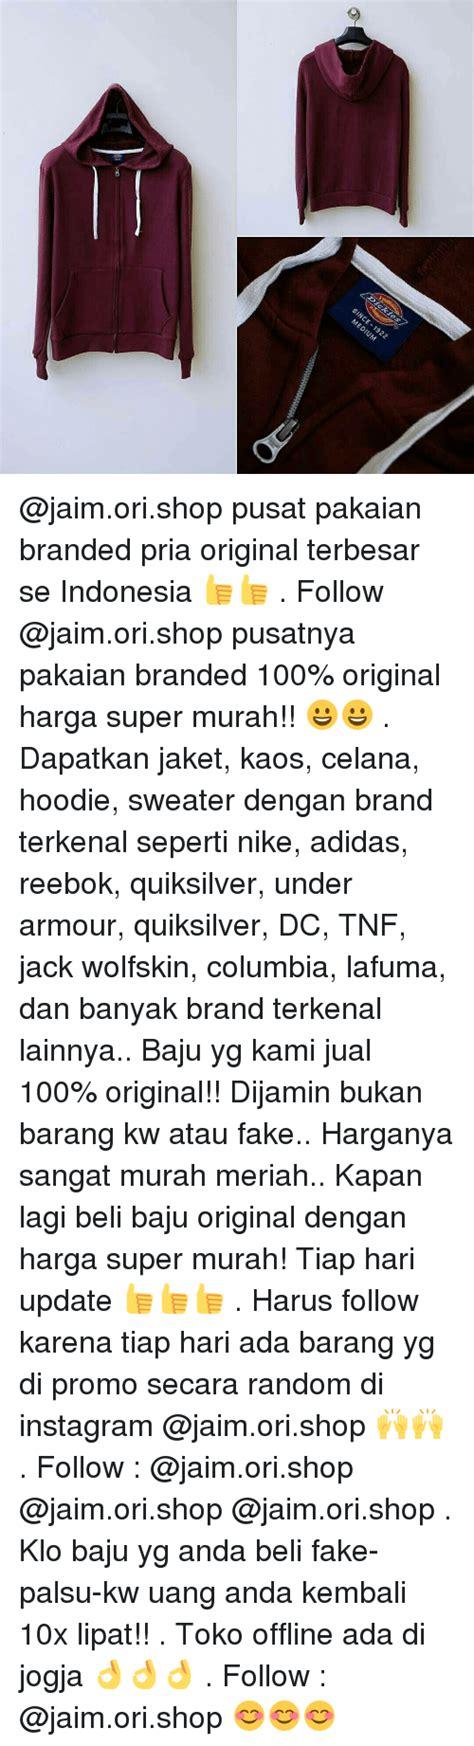 Harga Jaket Merk Adidas jaket adidas toko jual jaket merk adidas keren murah new